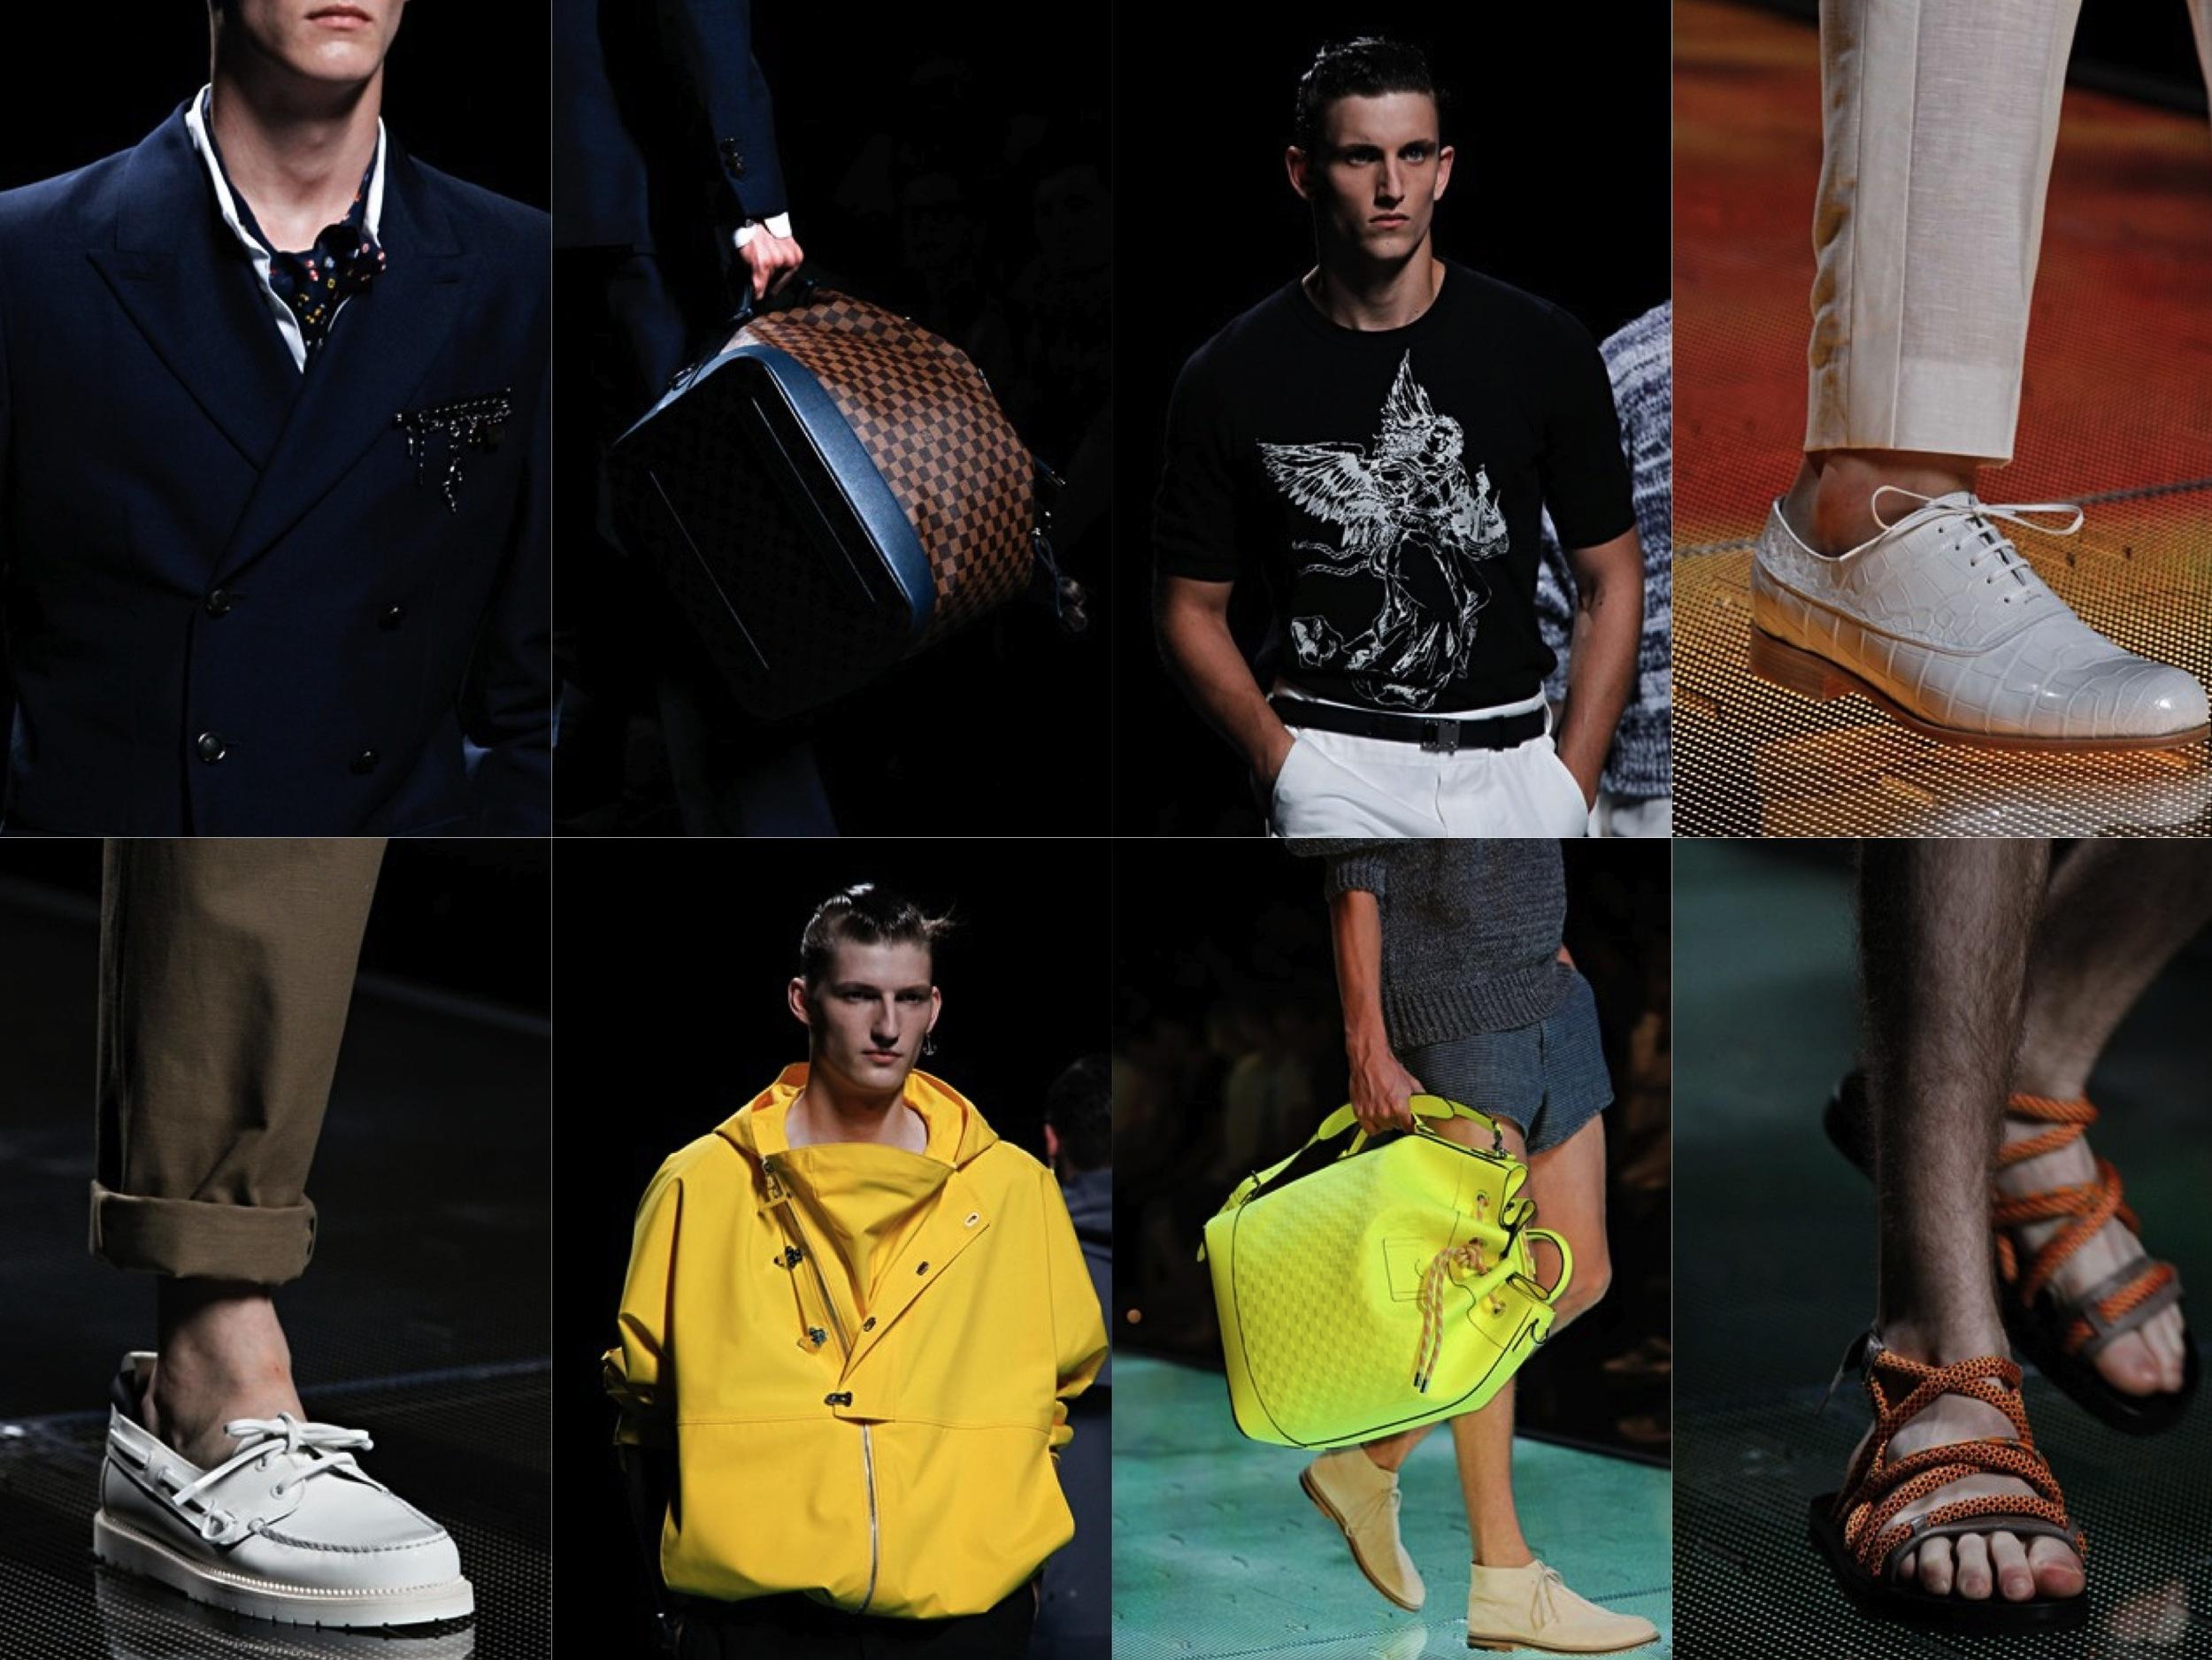 Louis Vuitton Spring Summer 2013 Menswear Highlights